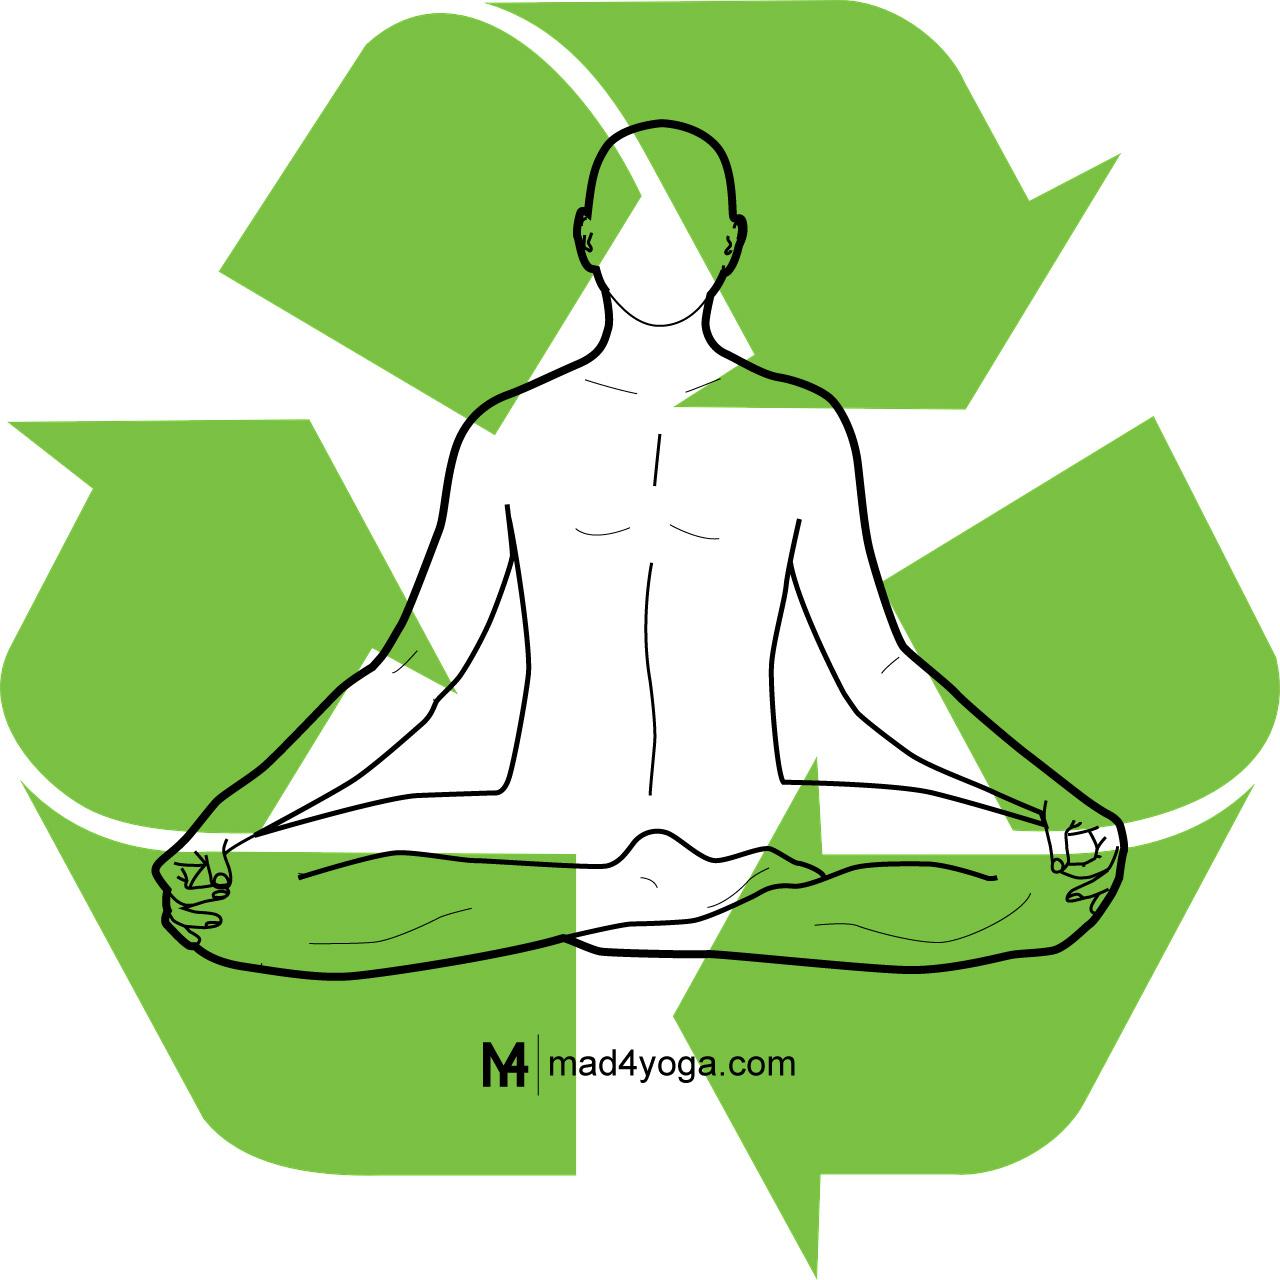 El reciclaje es yoga